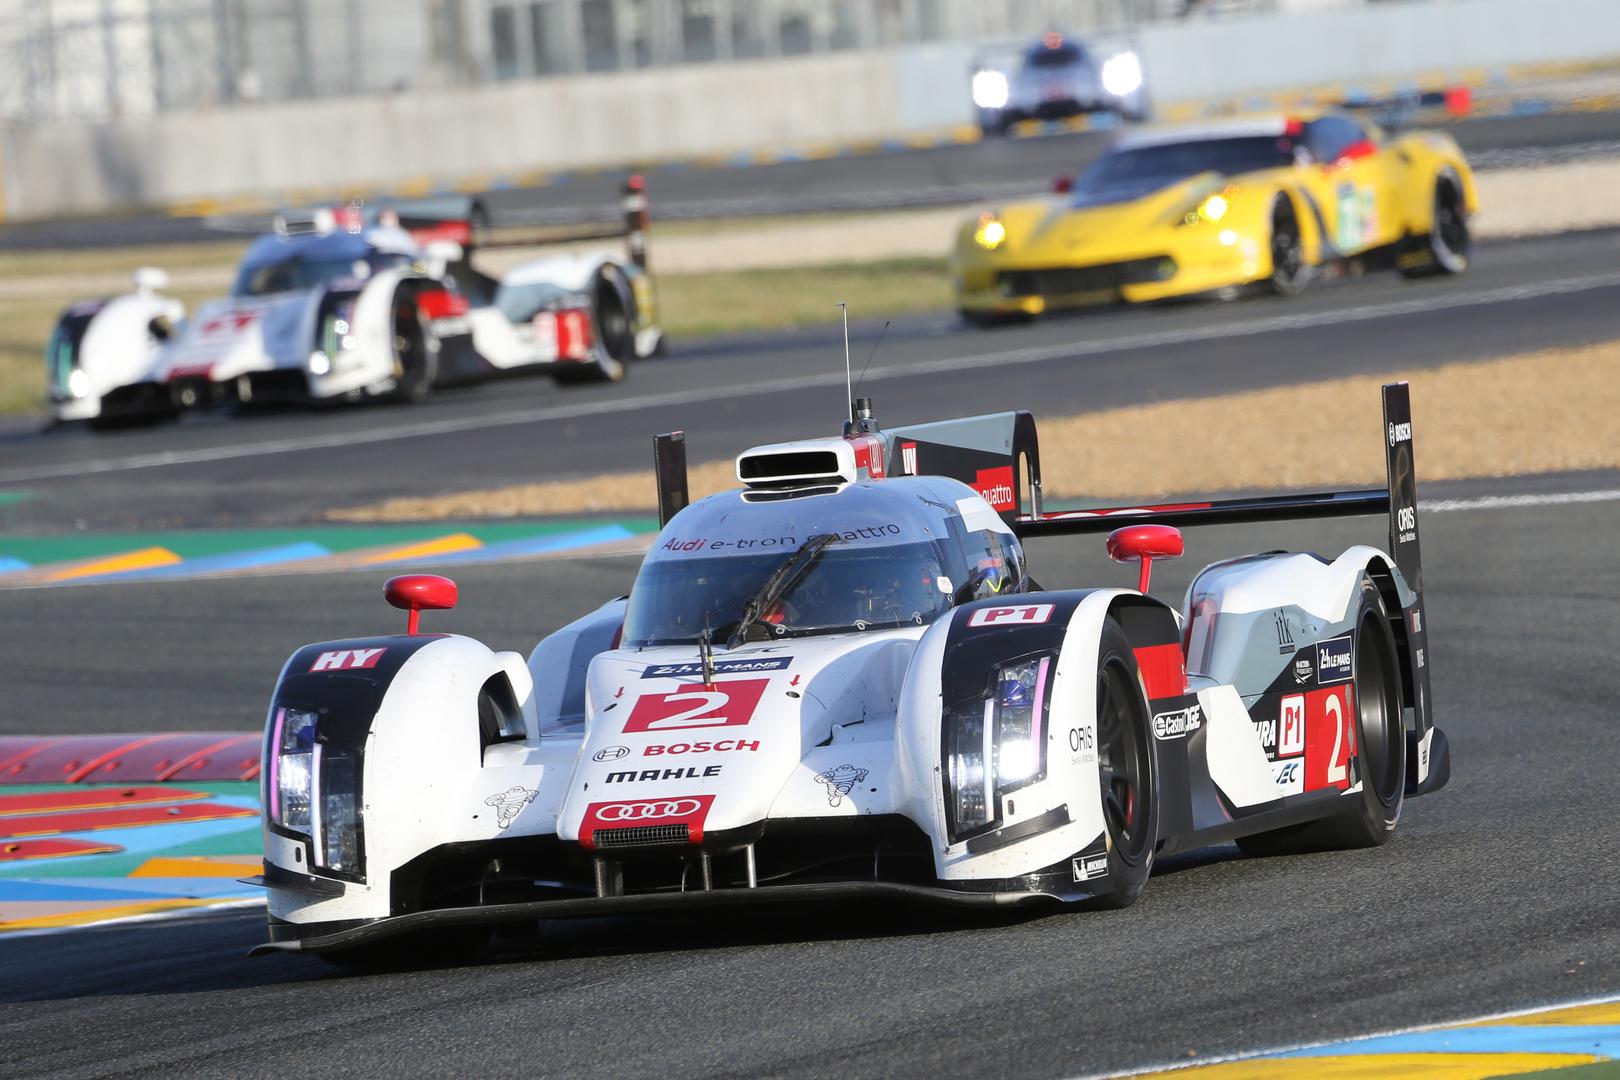 Audi R18 e-tron Quattro Le Mans Winner 2014